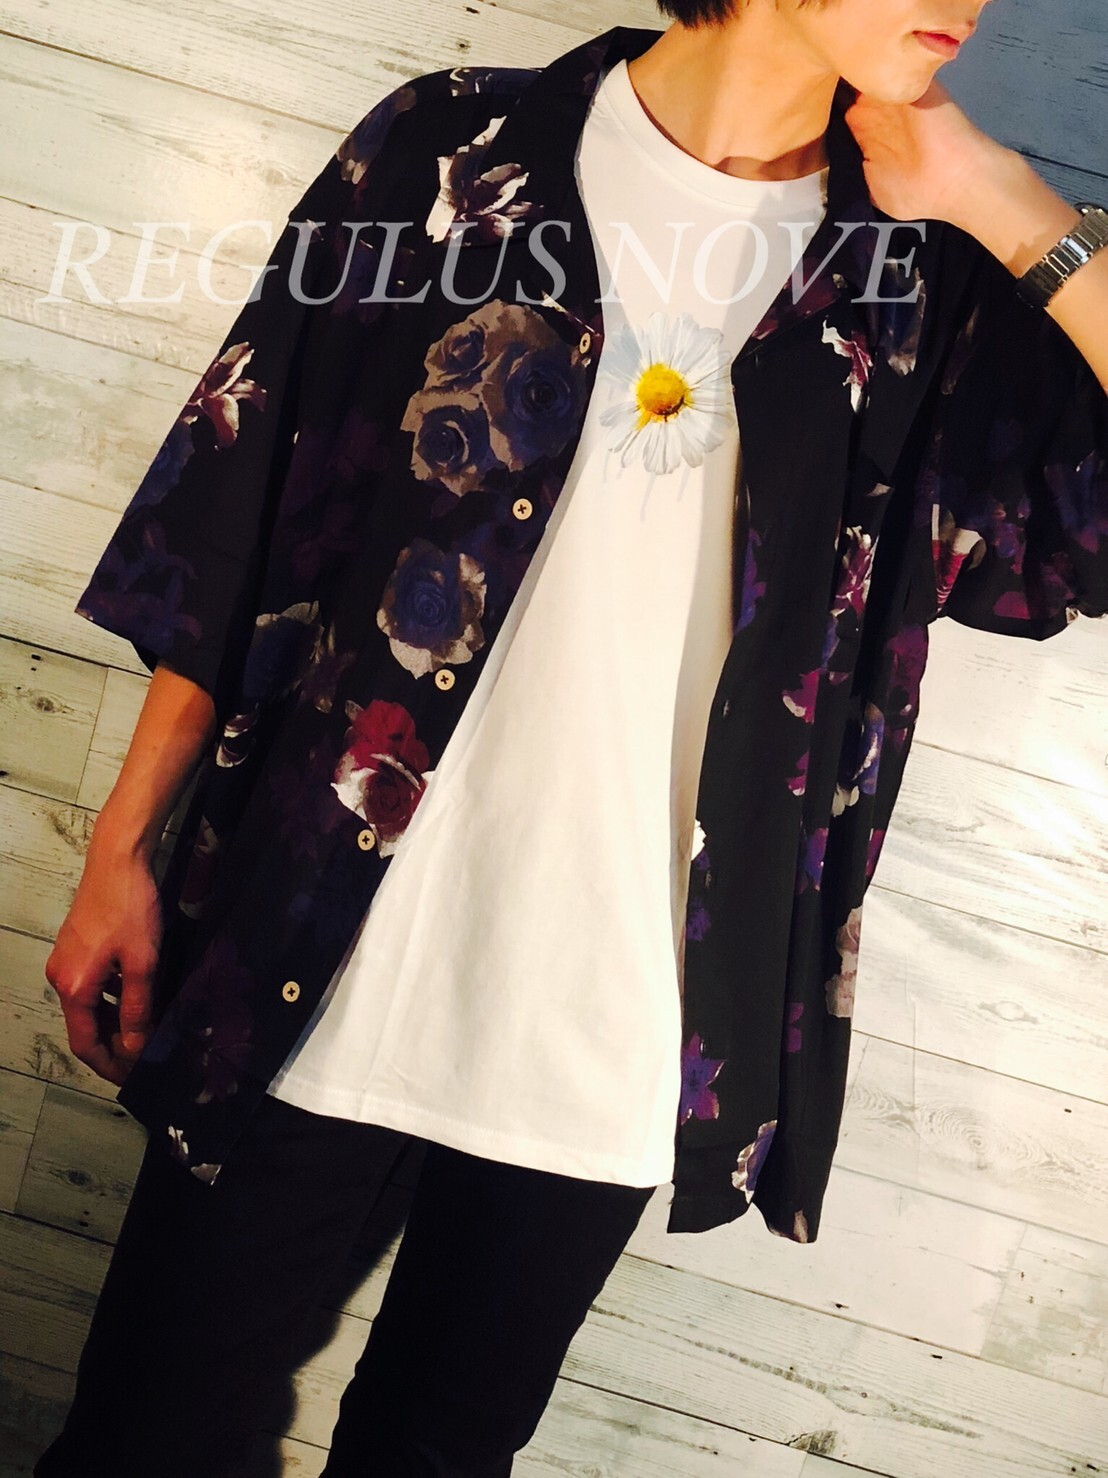 REGULUS NOVE BIGシルエットオープンカラーアロハシャツ BLACK ユニセックス レディース メンズ オーバーサイズ 大きいサイズ 派手 個性的 開襟シャツ トレンド